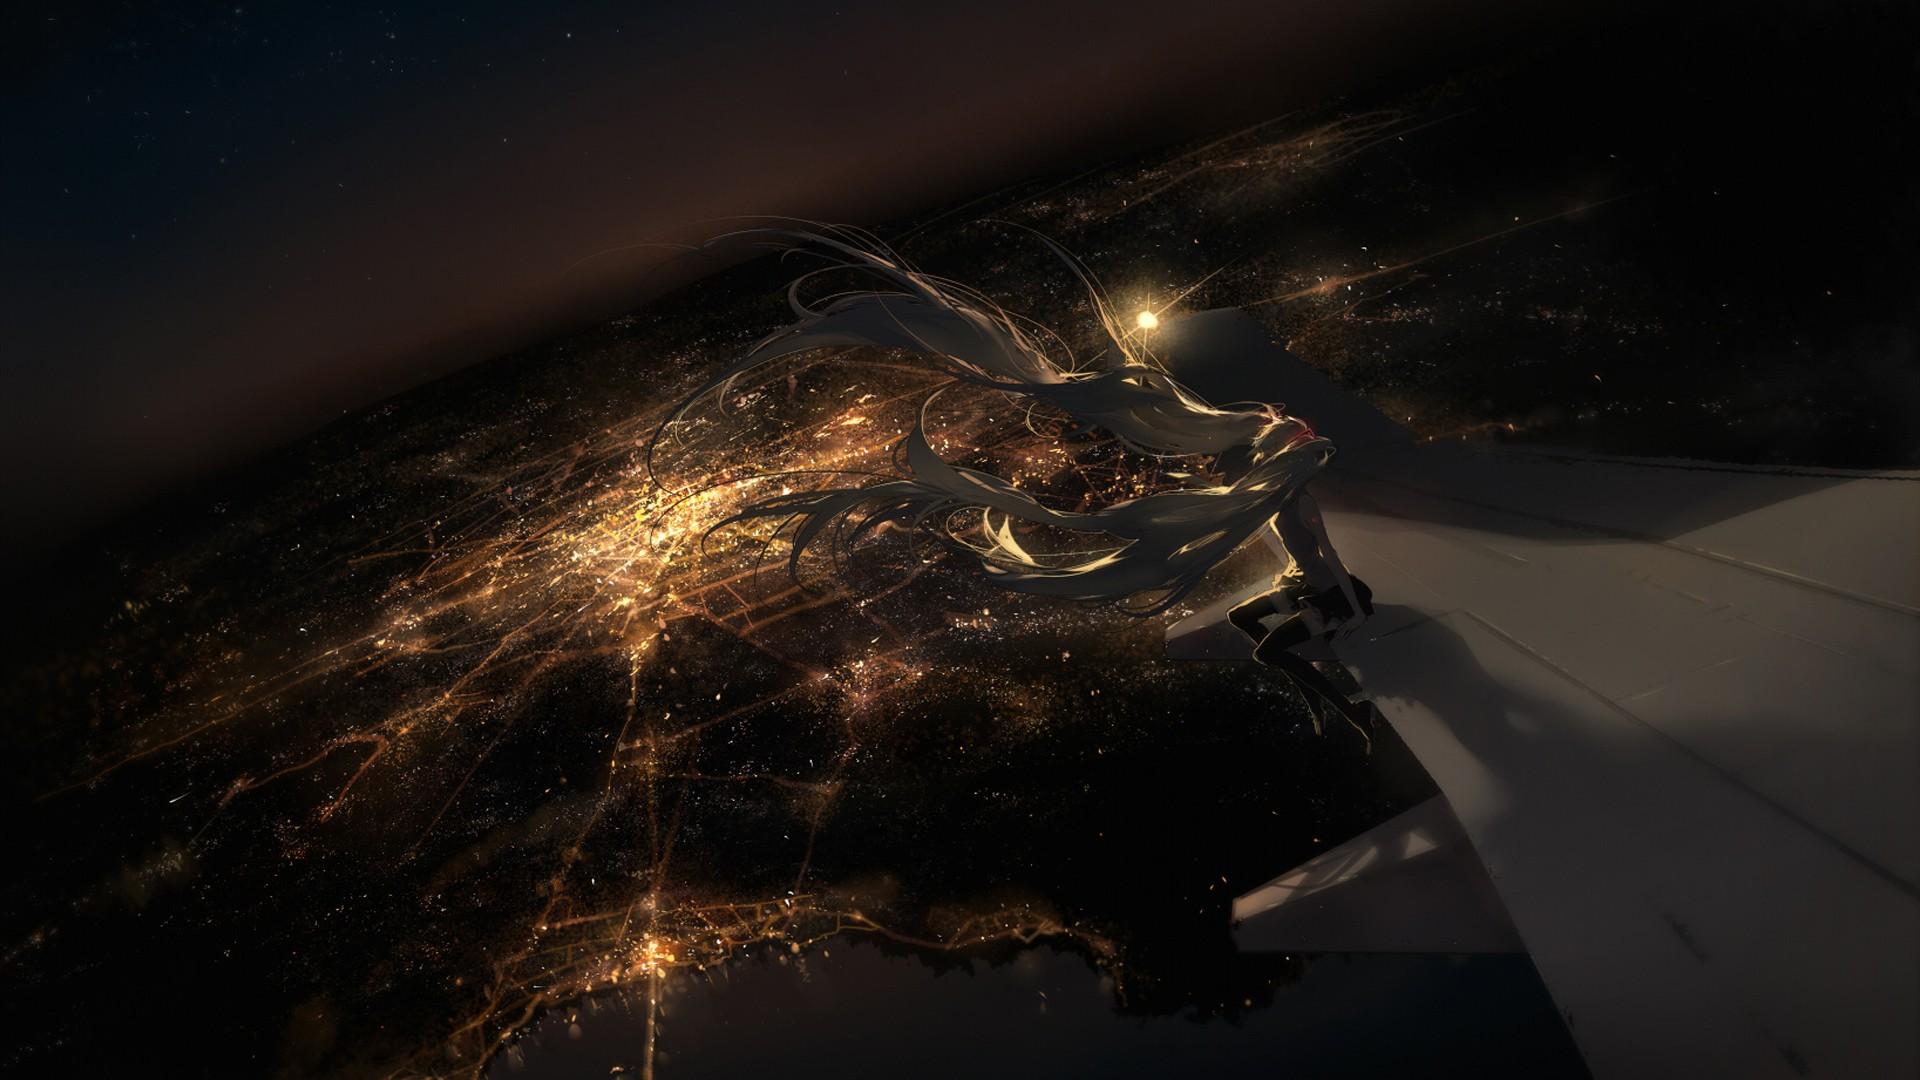 Anime 1920x1080 Hatsune Miku bird's eye view airplane anime aircraft lights cityscape